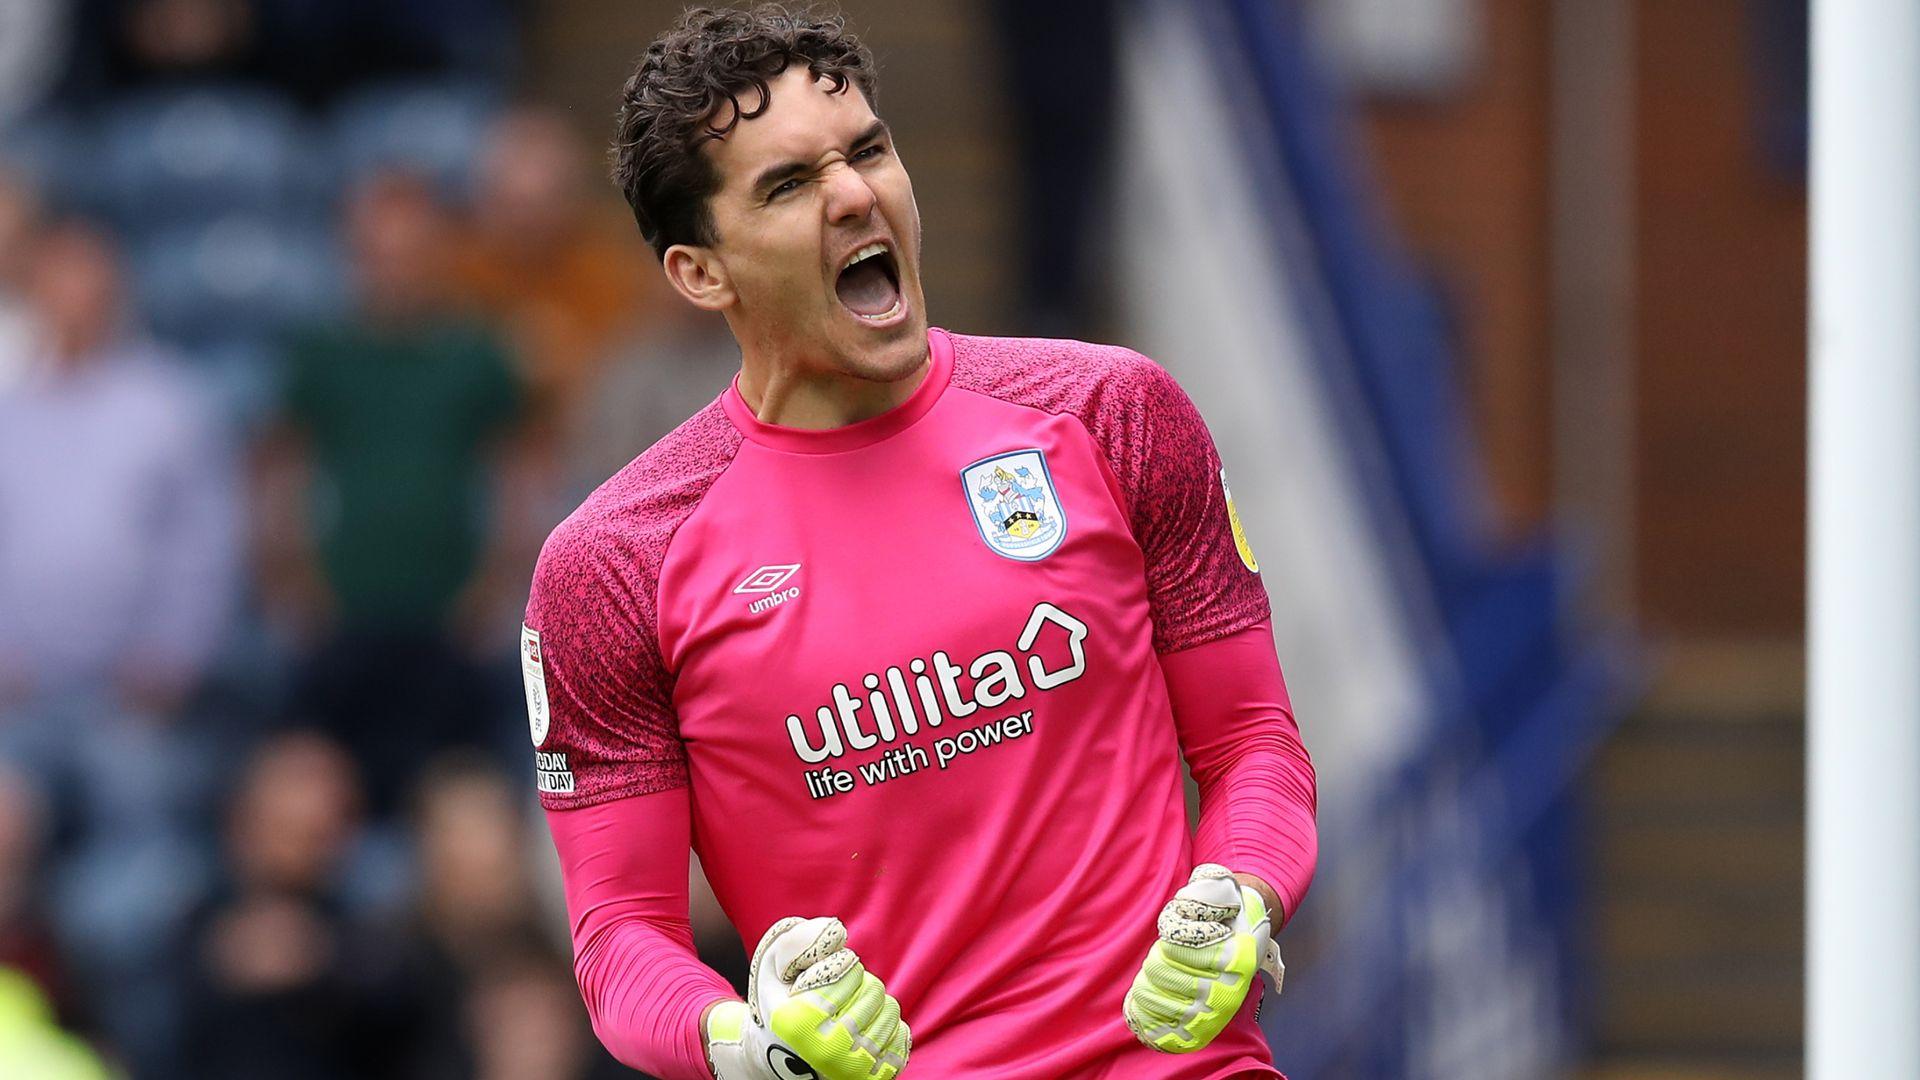 Nicholls penalty heroics as Huddersfield beat Owls